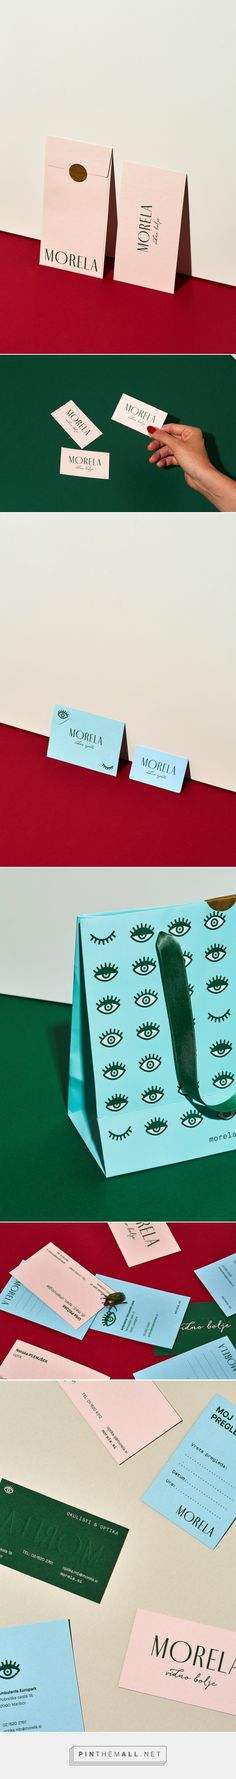 Morela rebranding — logo design, stationery and packaging